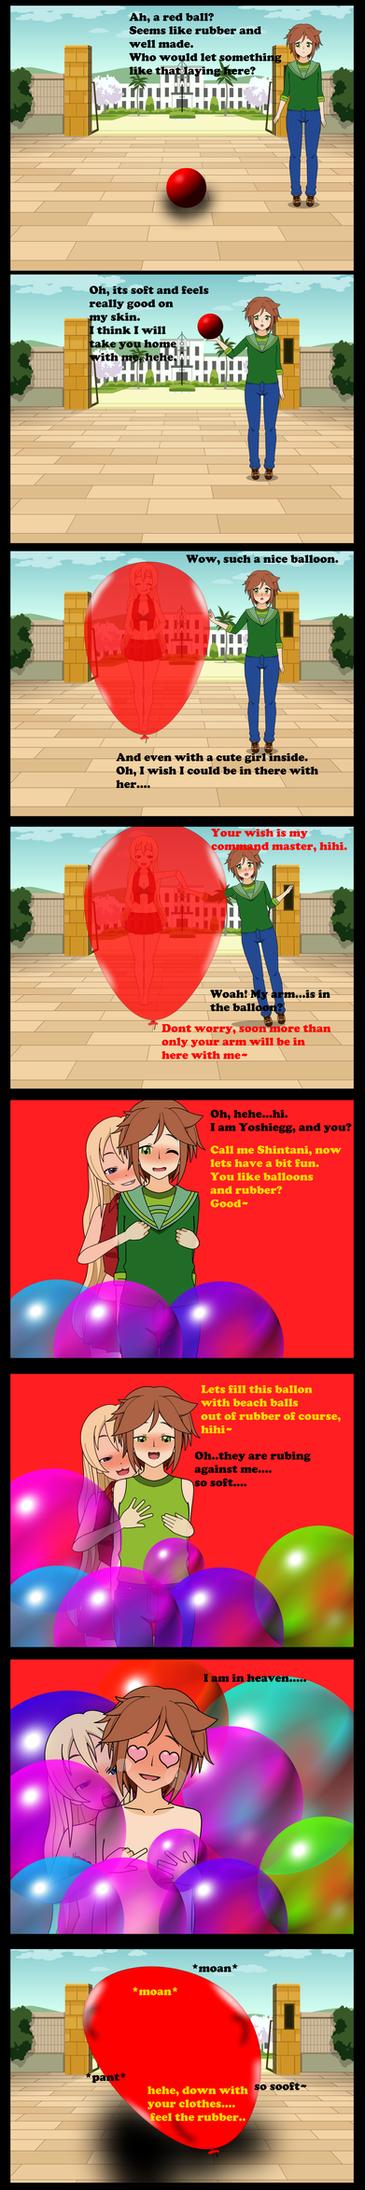 yoshiegg meets Shintani by AiblisTheBig